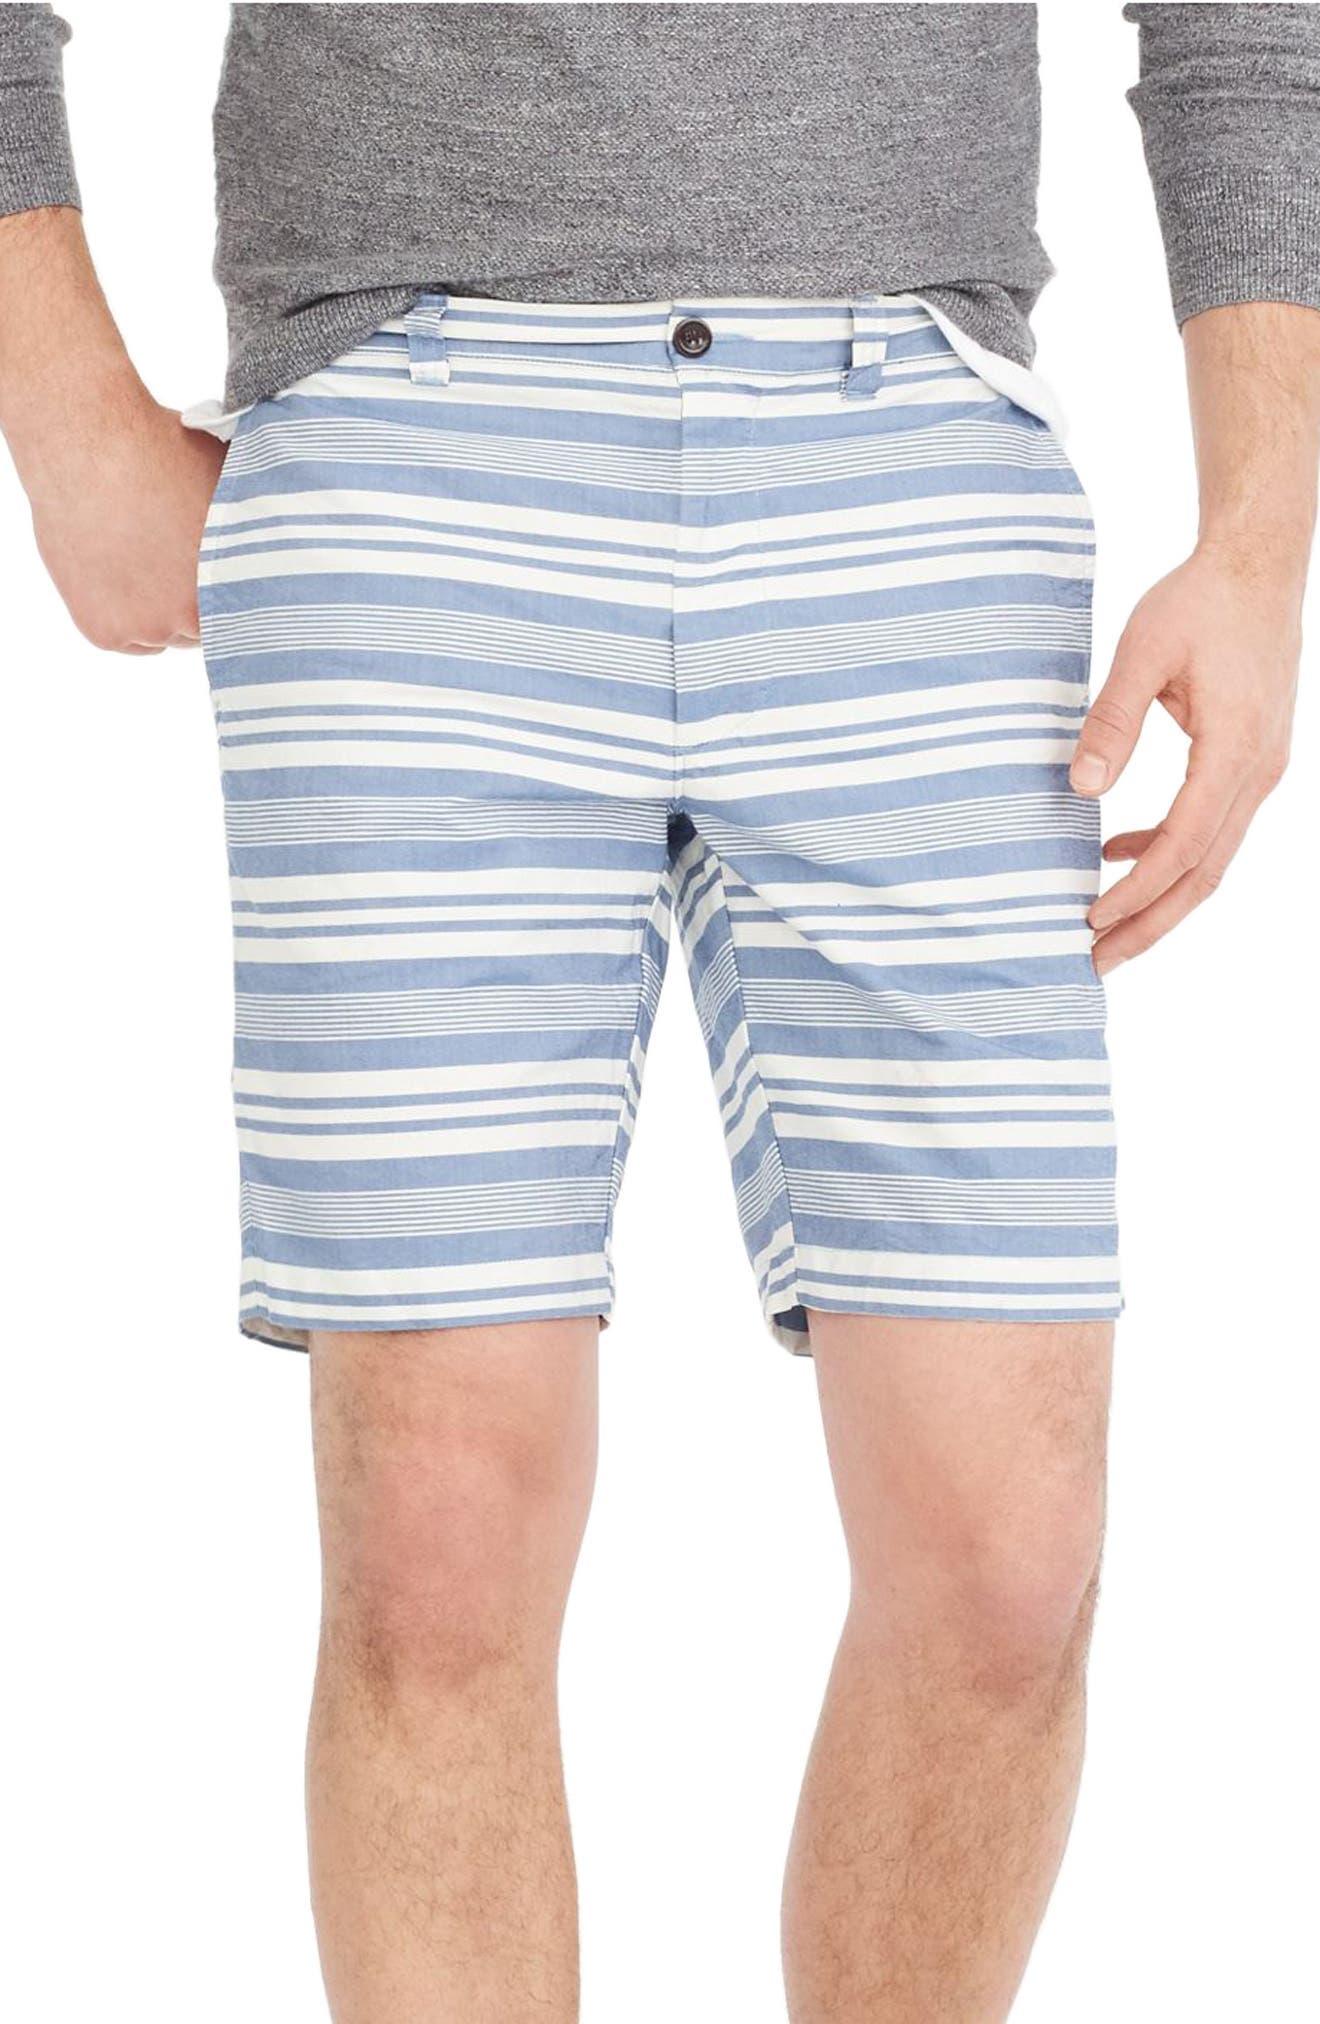 J.Crew Stripe Oxford Shorts